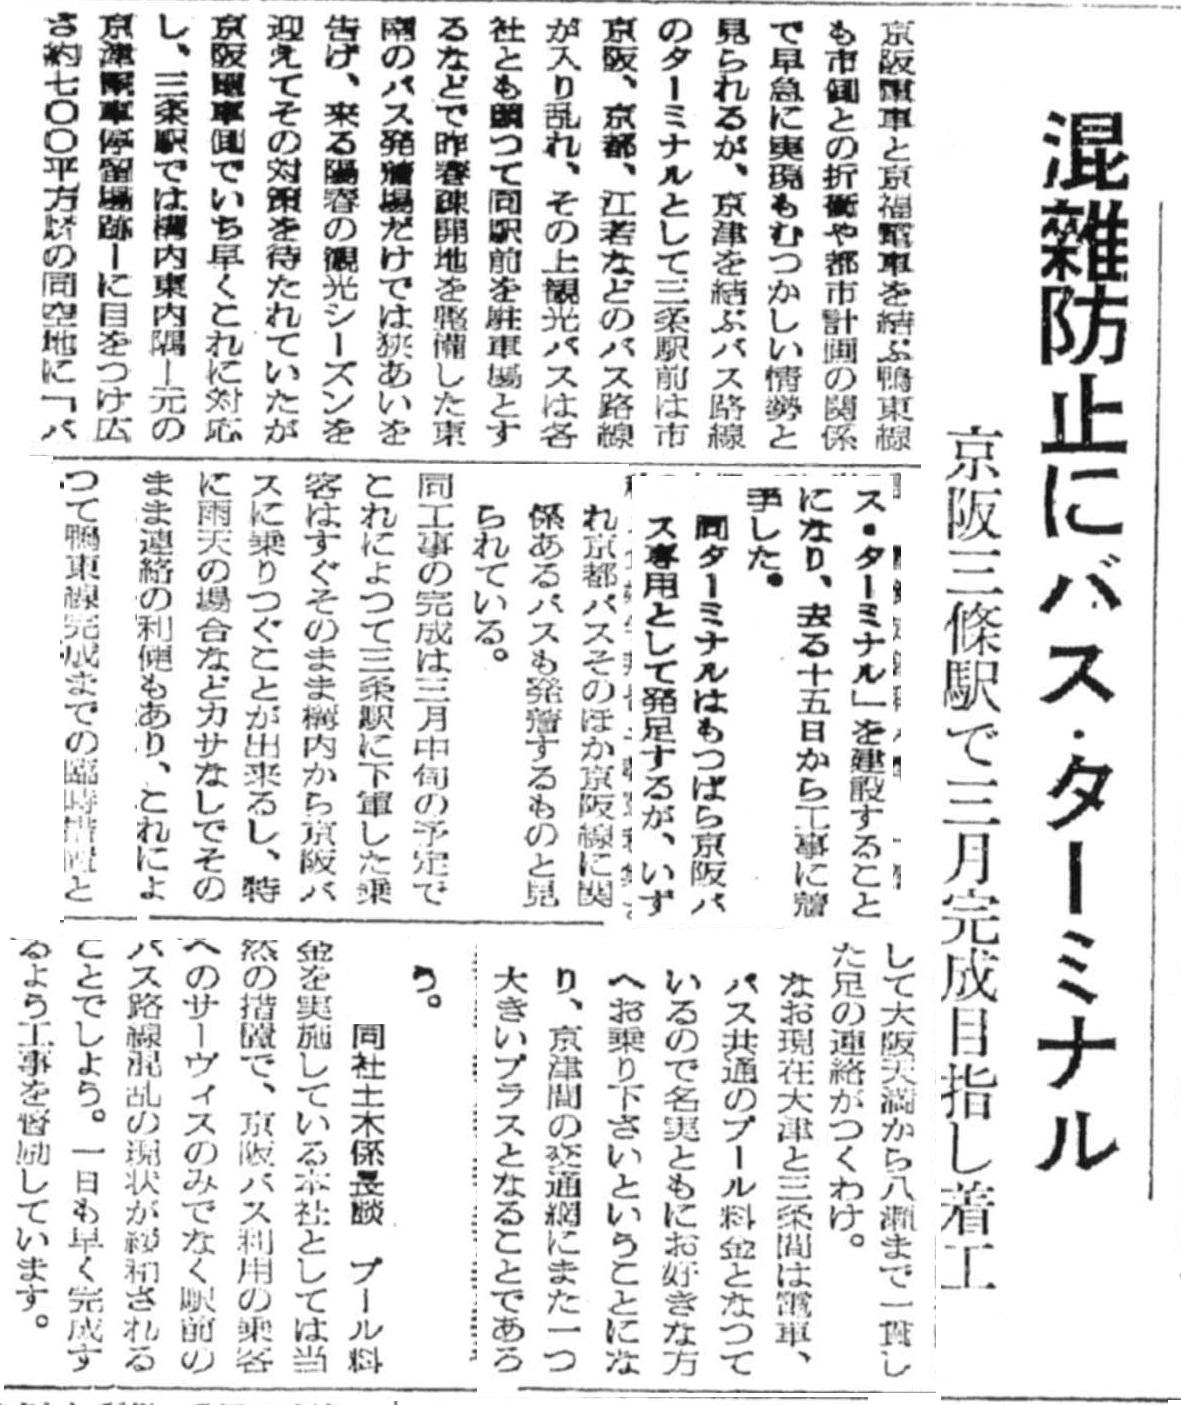 S27.1.25KC 三条京阪にBTb2